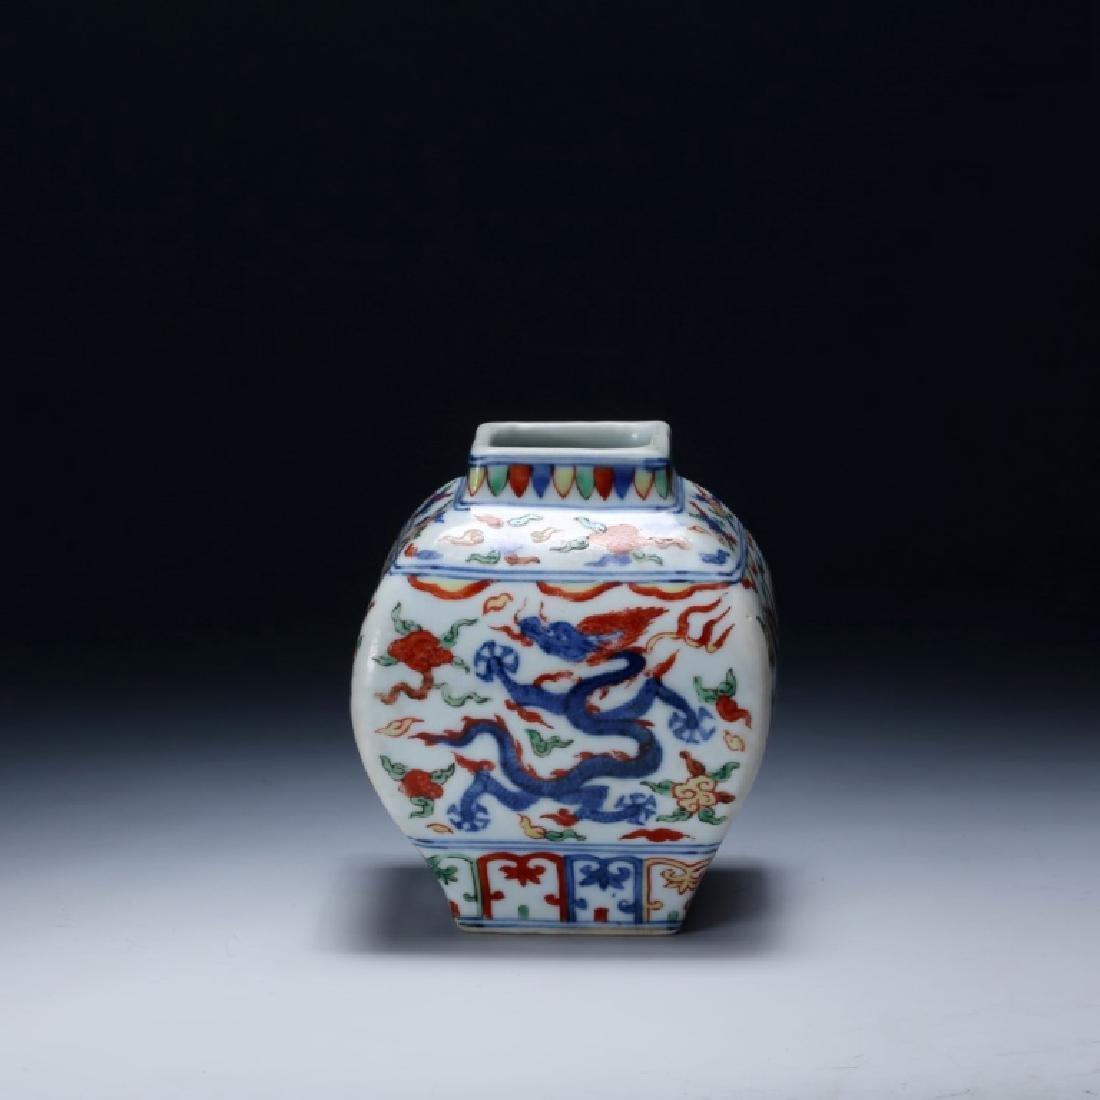 Chinese Qing Dynasty Wucai Porcelain Jar